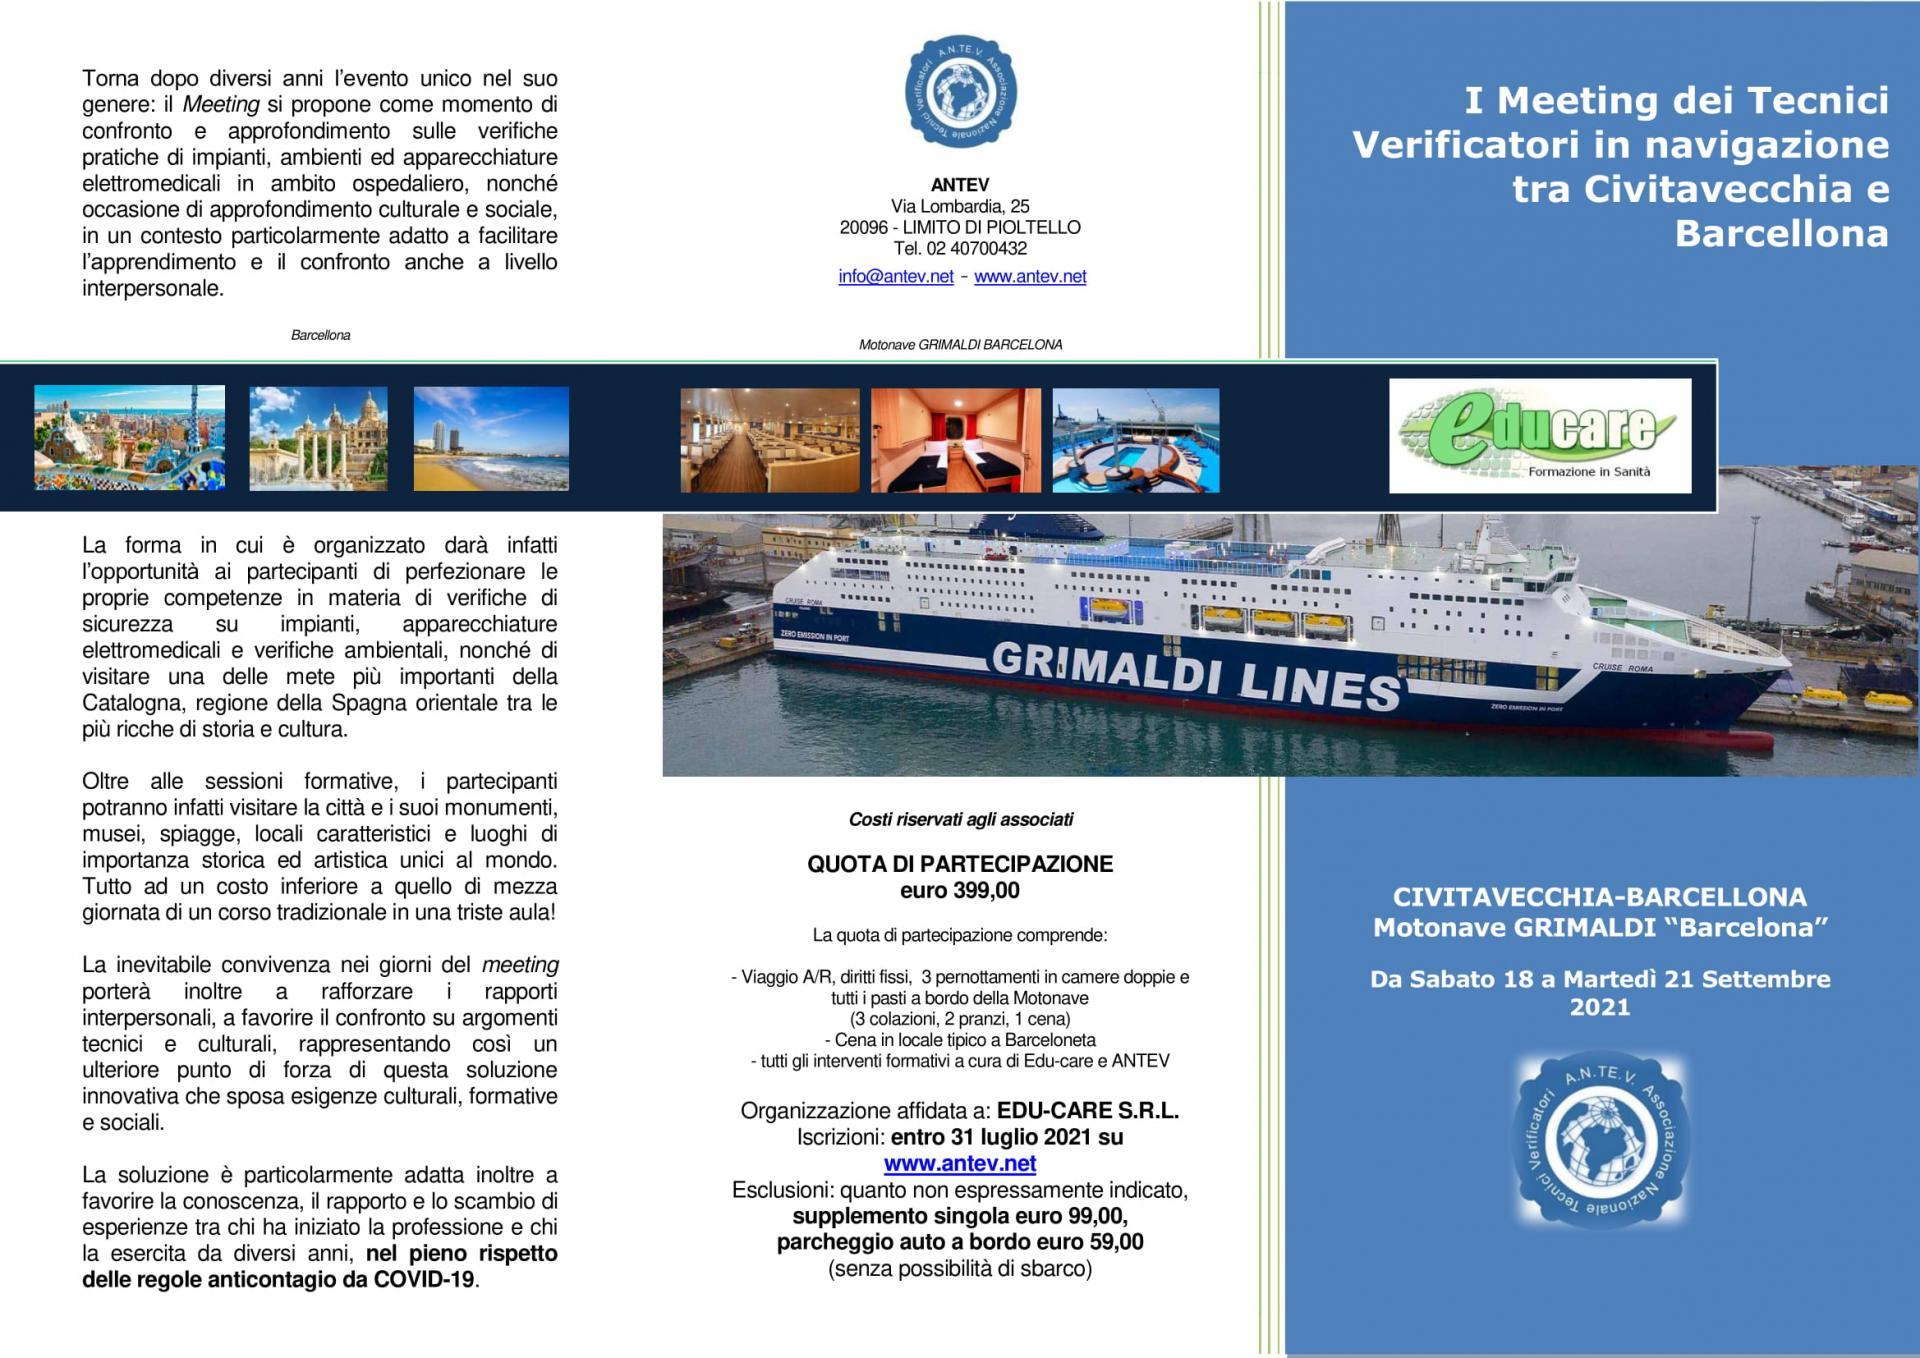 Depliant i meeting verificatori barcellona 2021 2